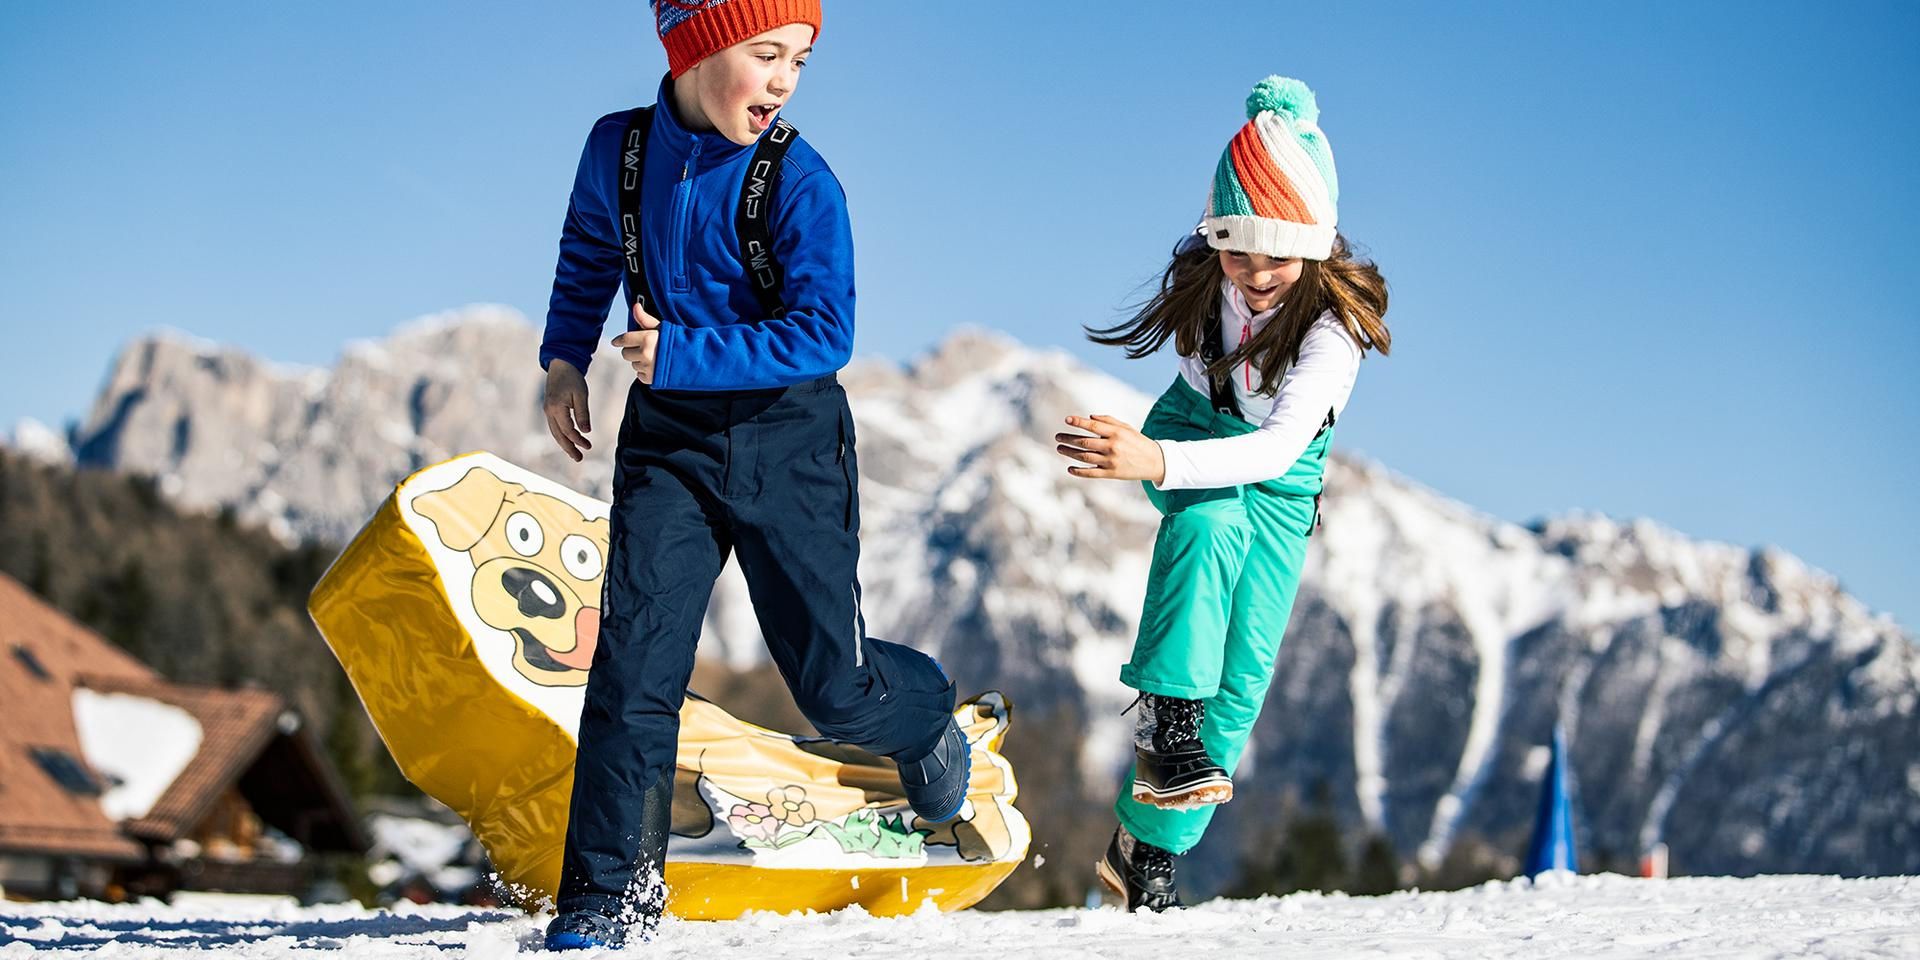 Unser Skisortiment für Kinder